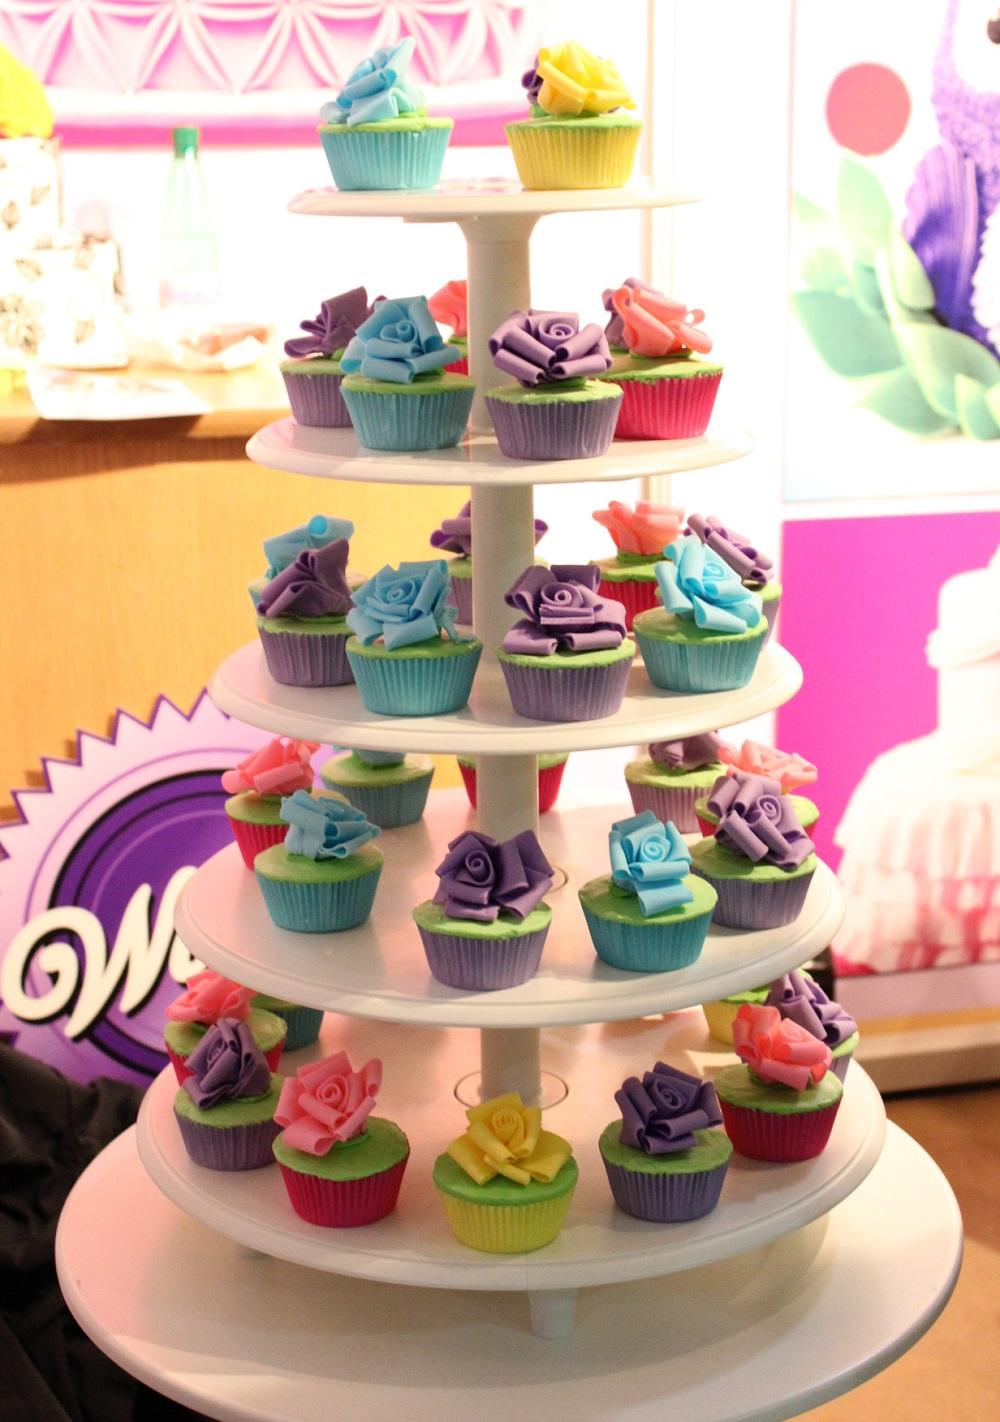 Cake And Bake Show 2013 20